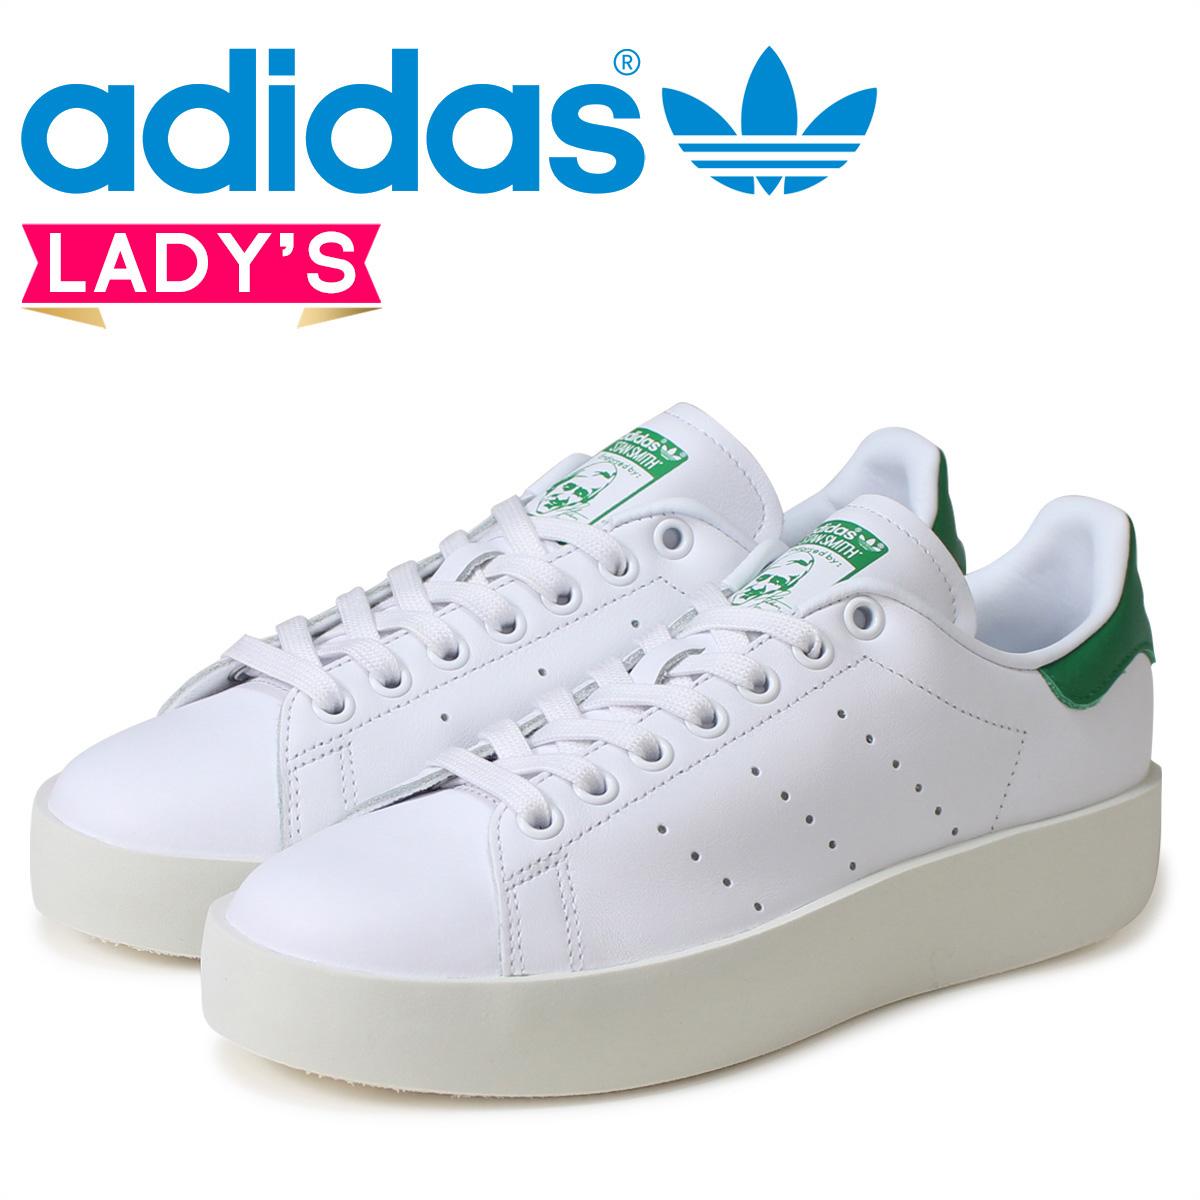 8ce42225020e Adidas originals adidas Originals Jeremy Scott Jeremy Scott P SOLE sneakers  Q23665 canvas men s ladies ピーソール ObyO